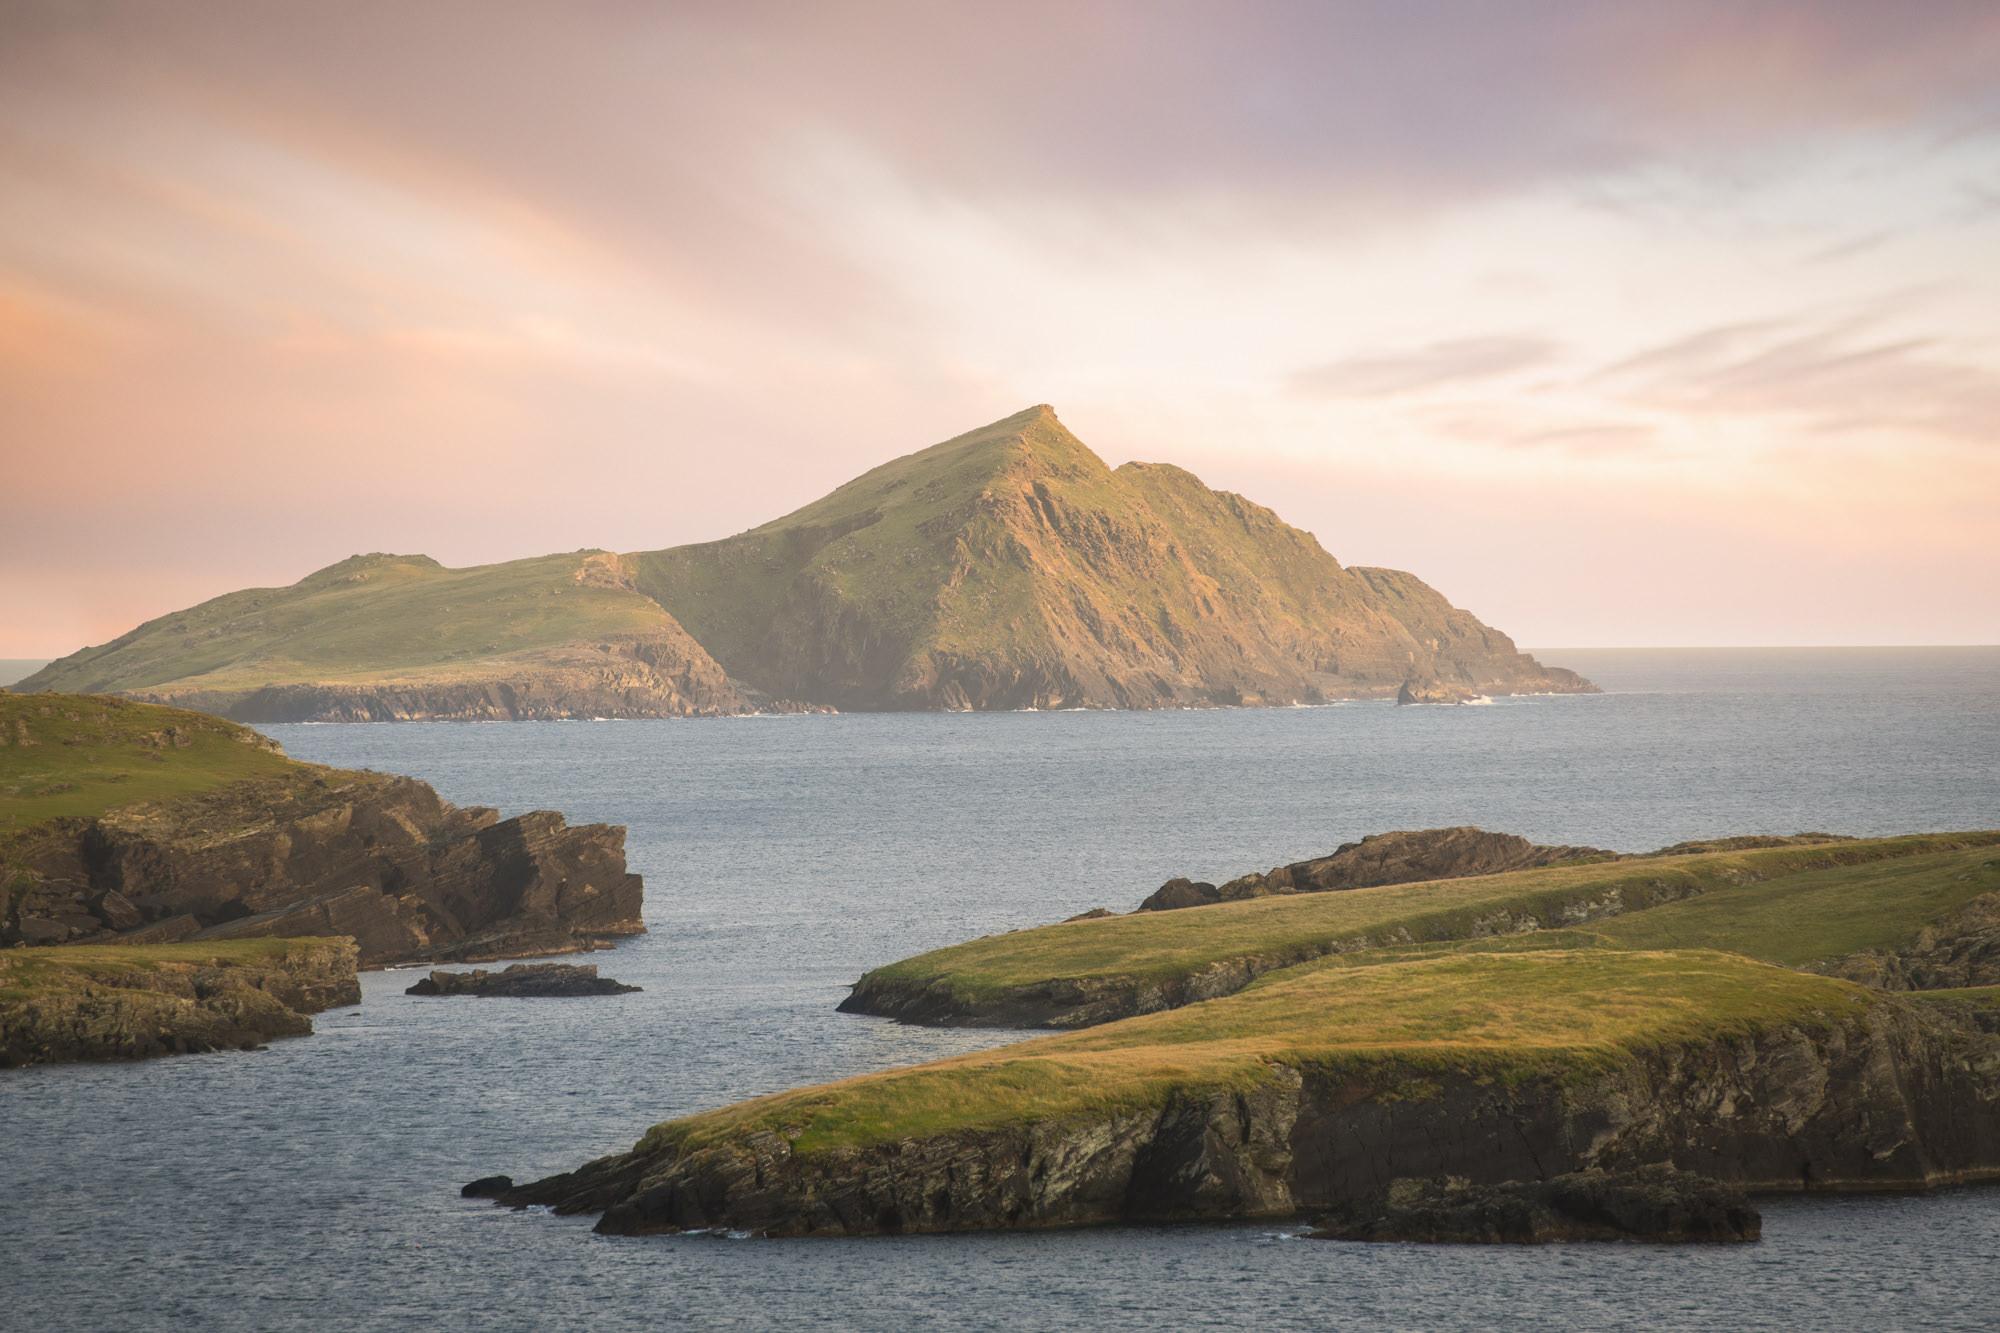 Sunset over a dramatic coastline in ireland